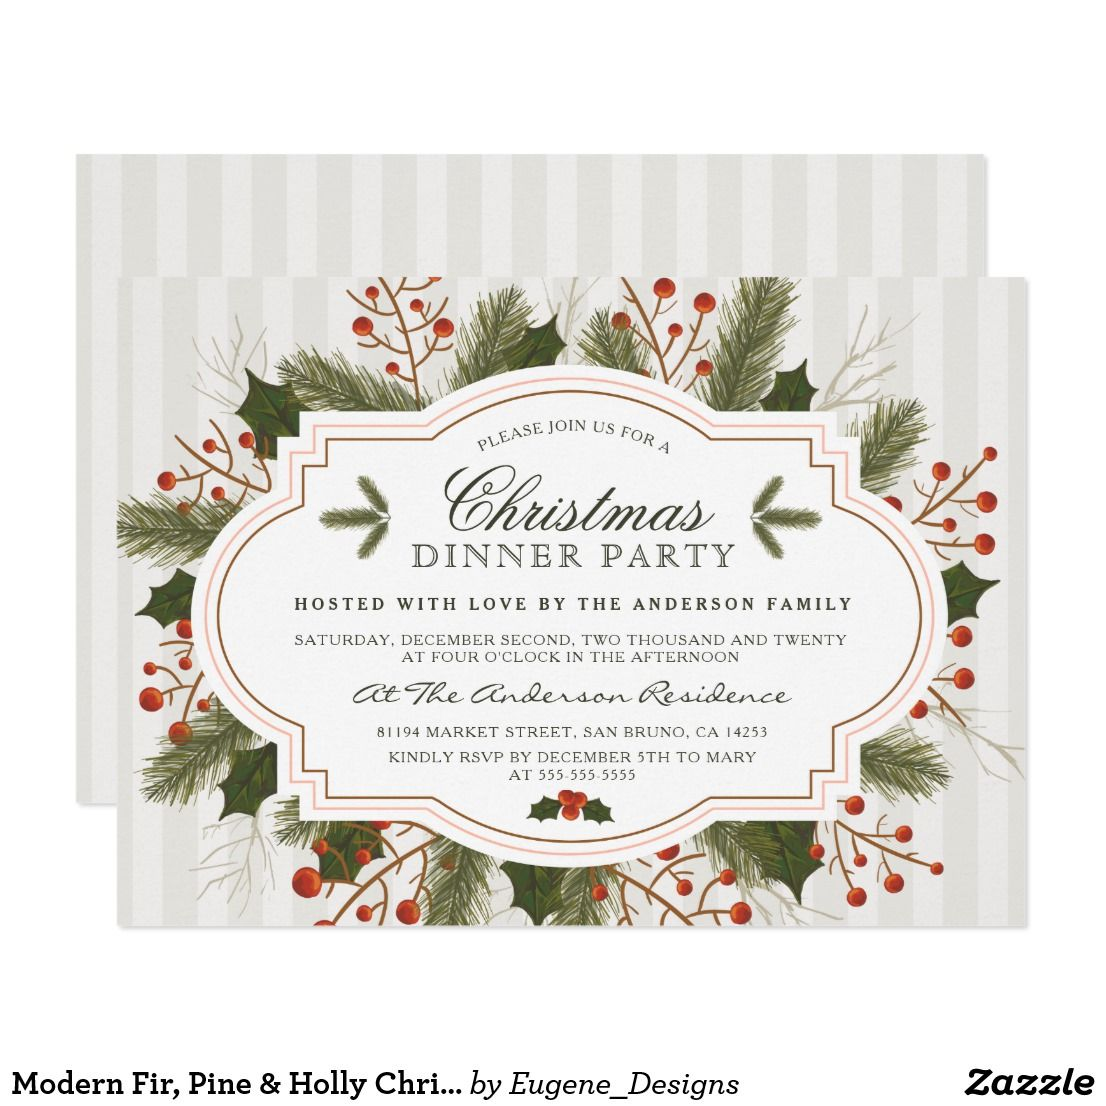 Modern Fir, Pine & Holly Christmas Dinner Party Card | Zazzler\'s ...